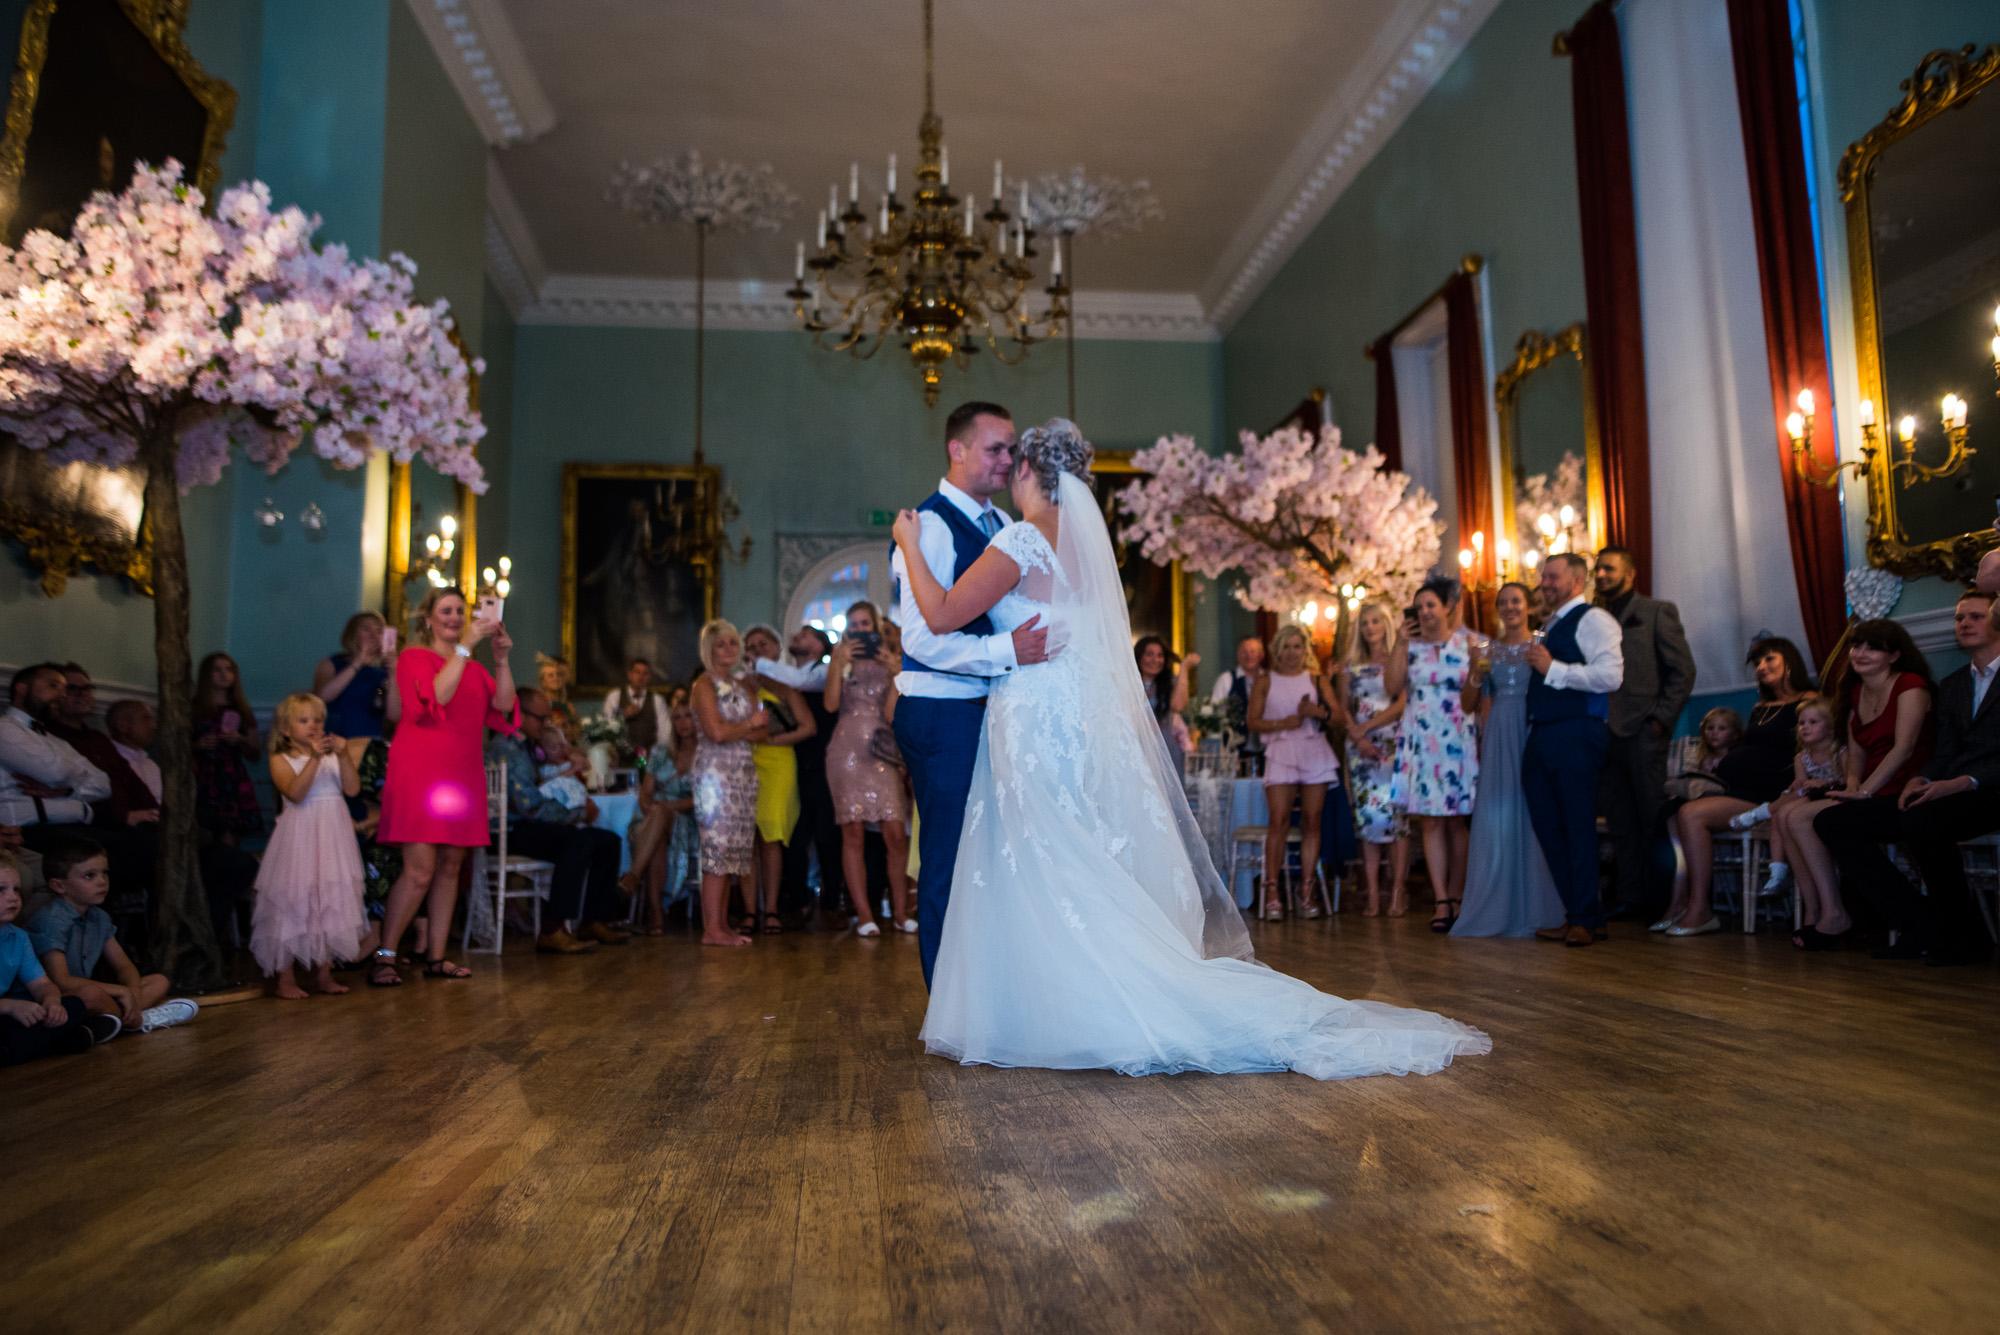 Savannah and Josh wedding photos (335 of 350).jpg